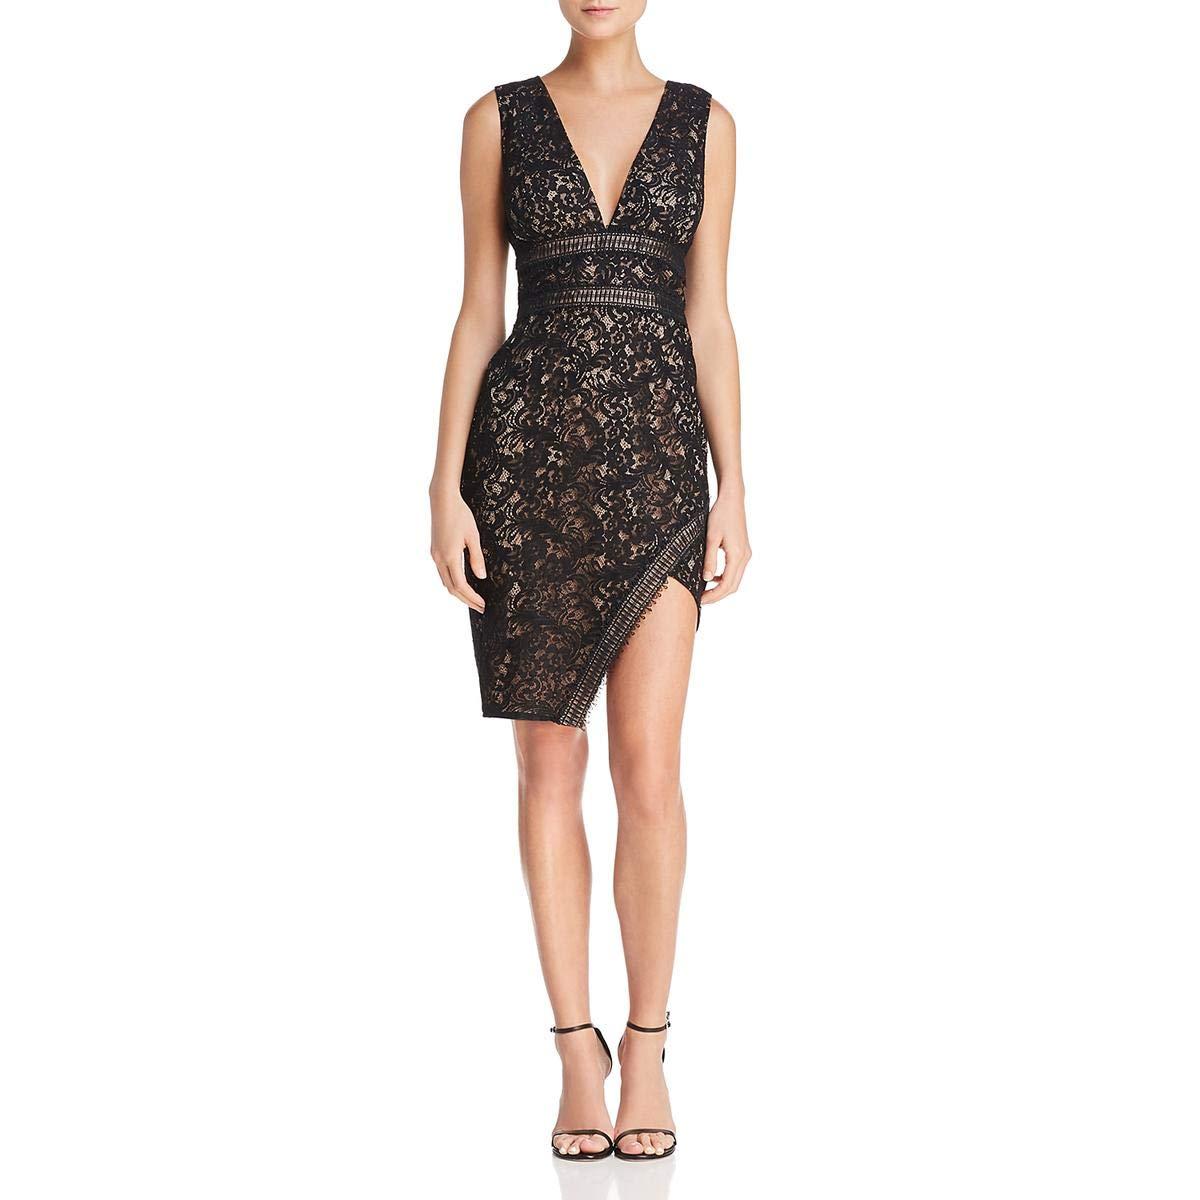 Black StyleStalker Womens Lace Mini Cocktail Dress